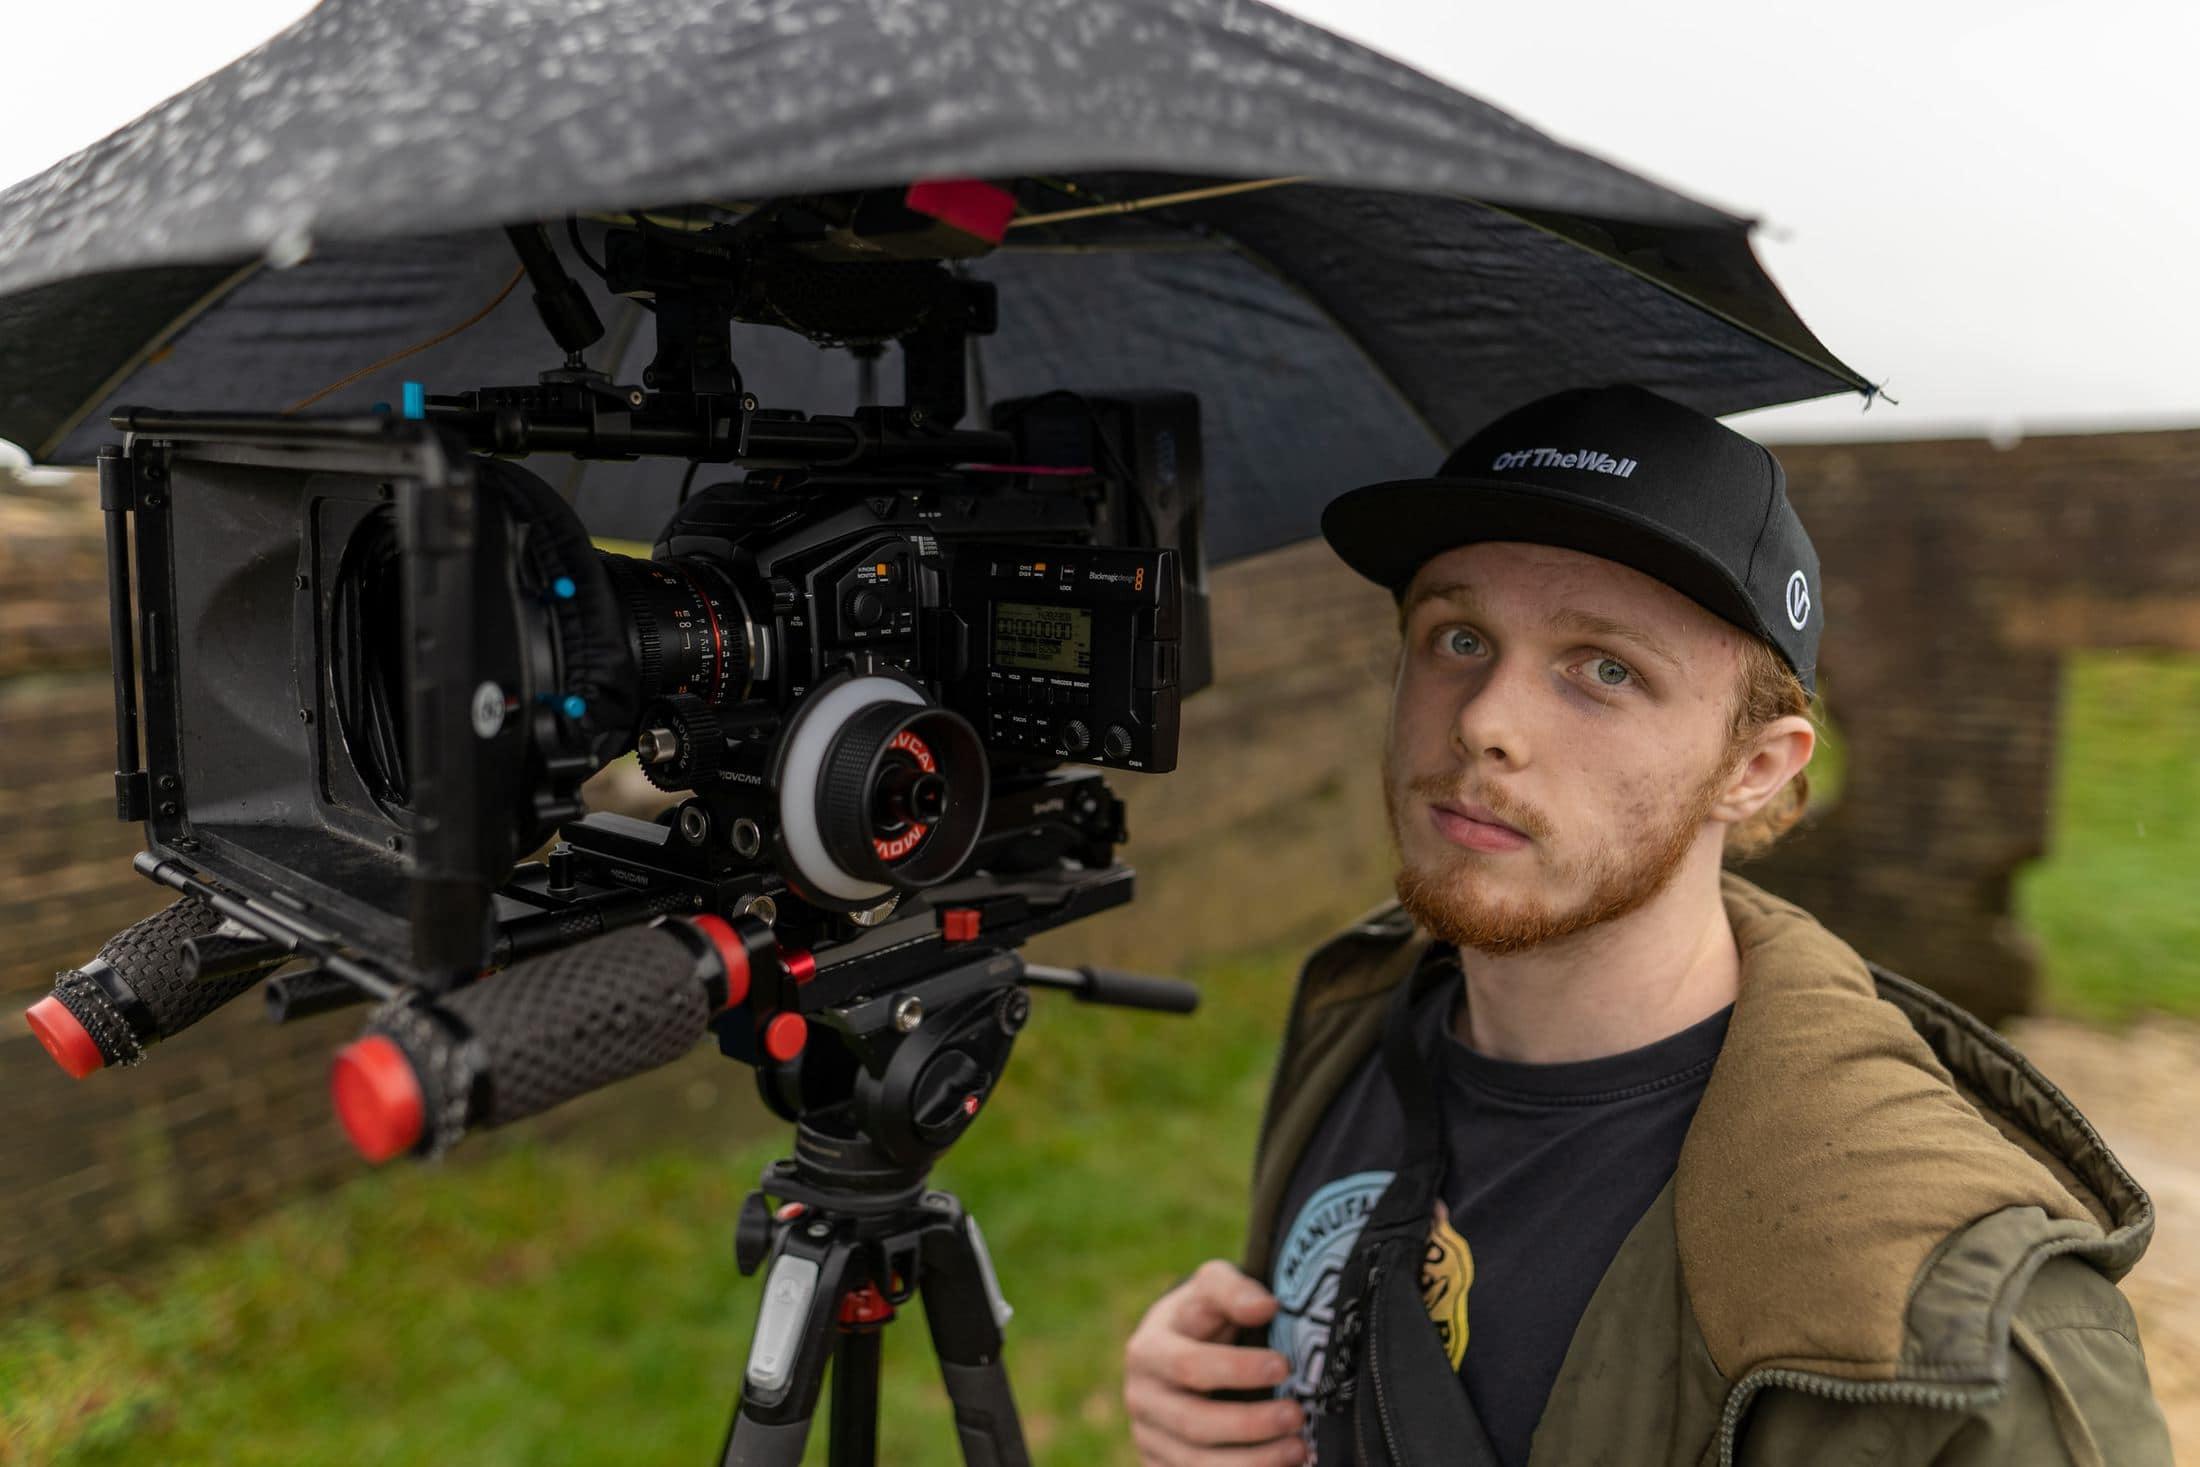 man in brown jacket holding black camera